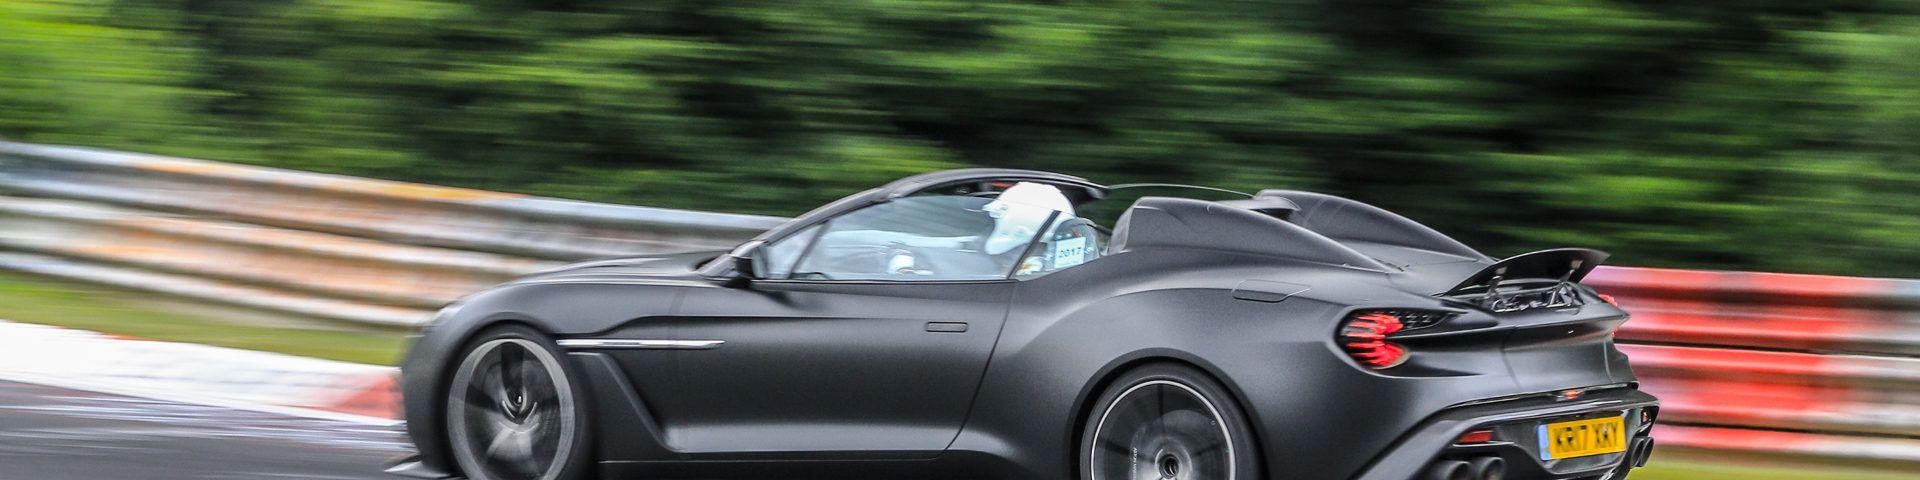 Aston Martin Zagato Speedster Nürburgring